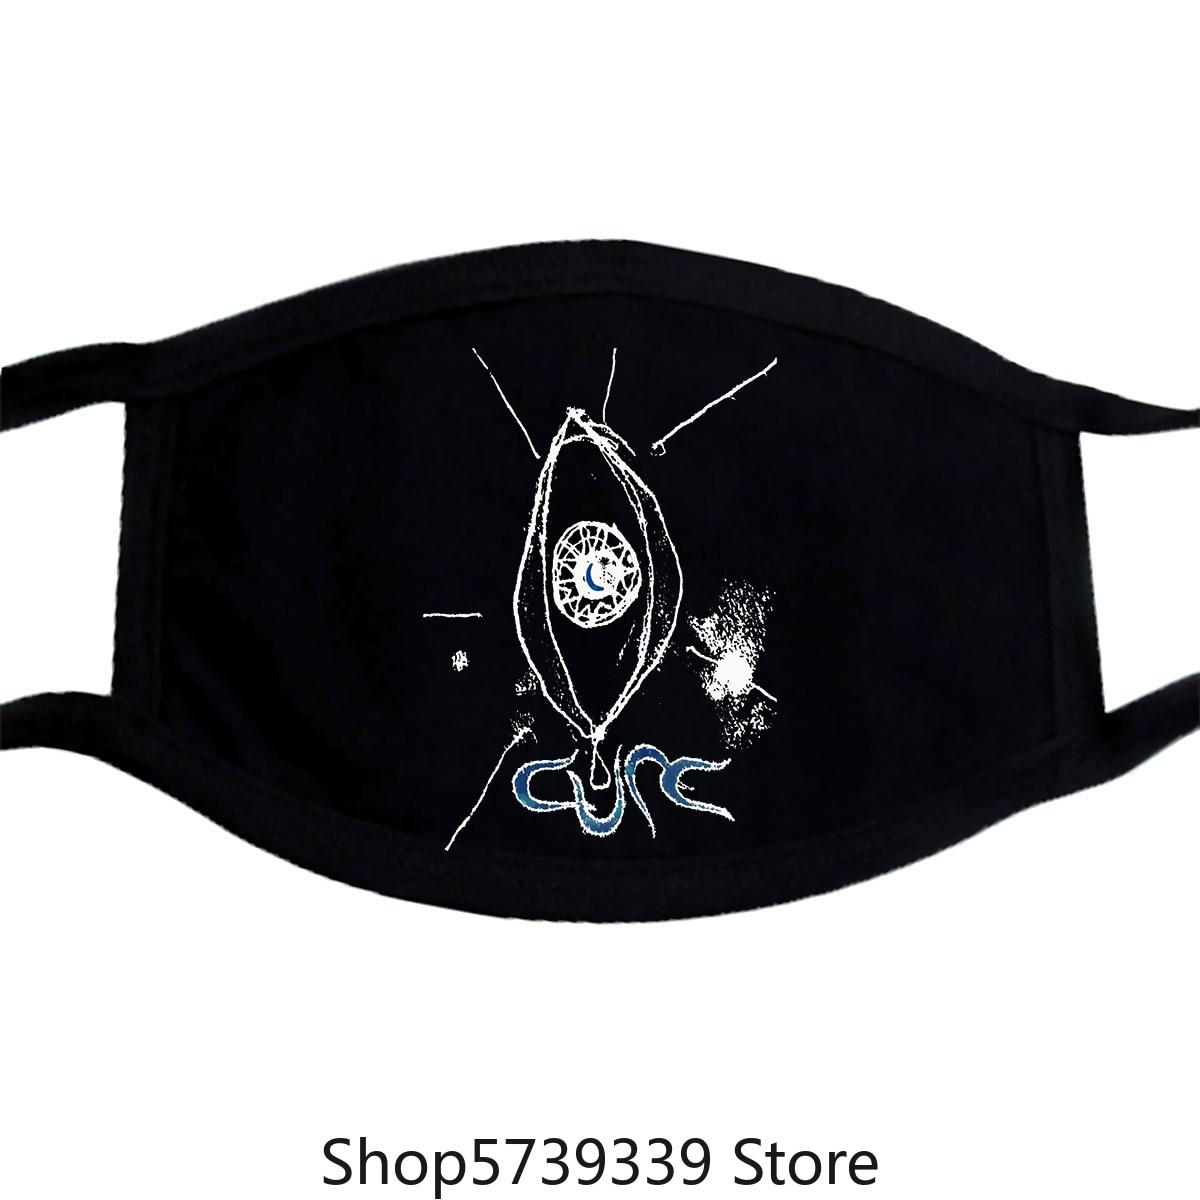 The Cure Band Punk Gothic New Black Short Long Sleeve Mask Washable Reusable Mask